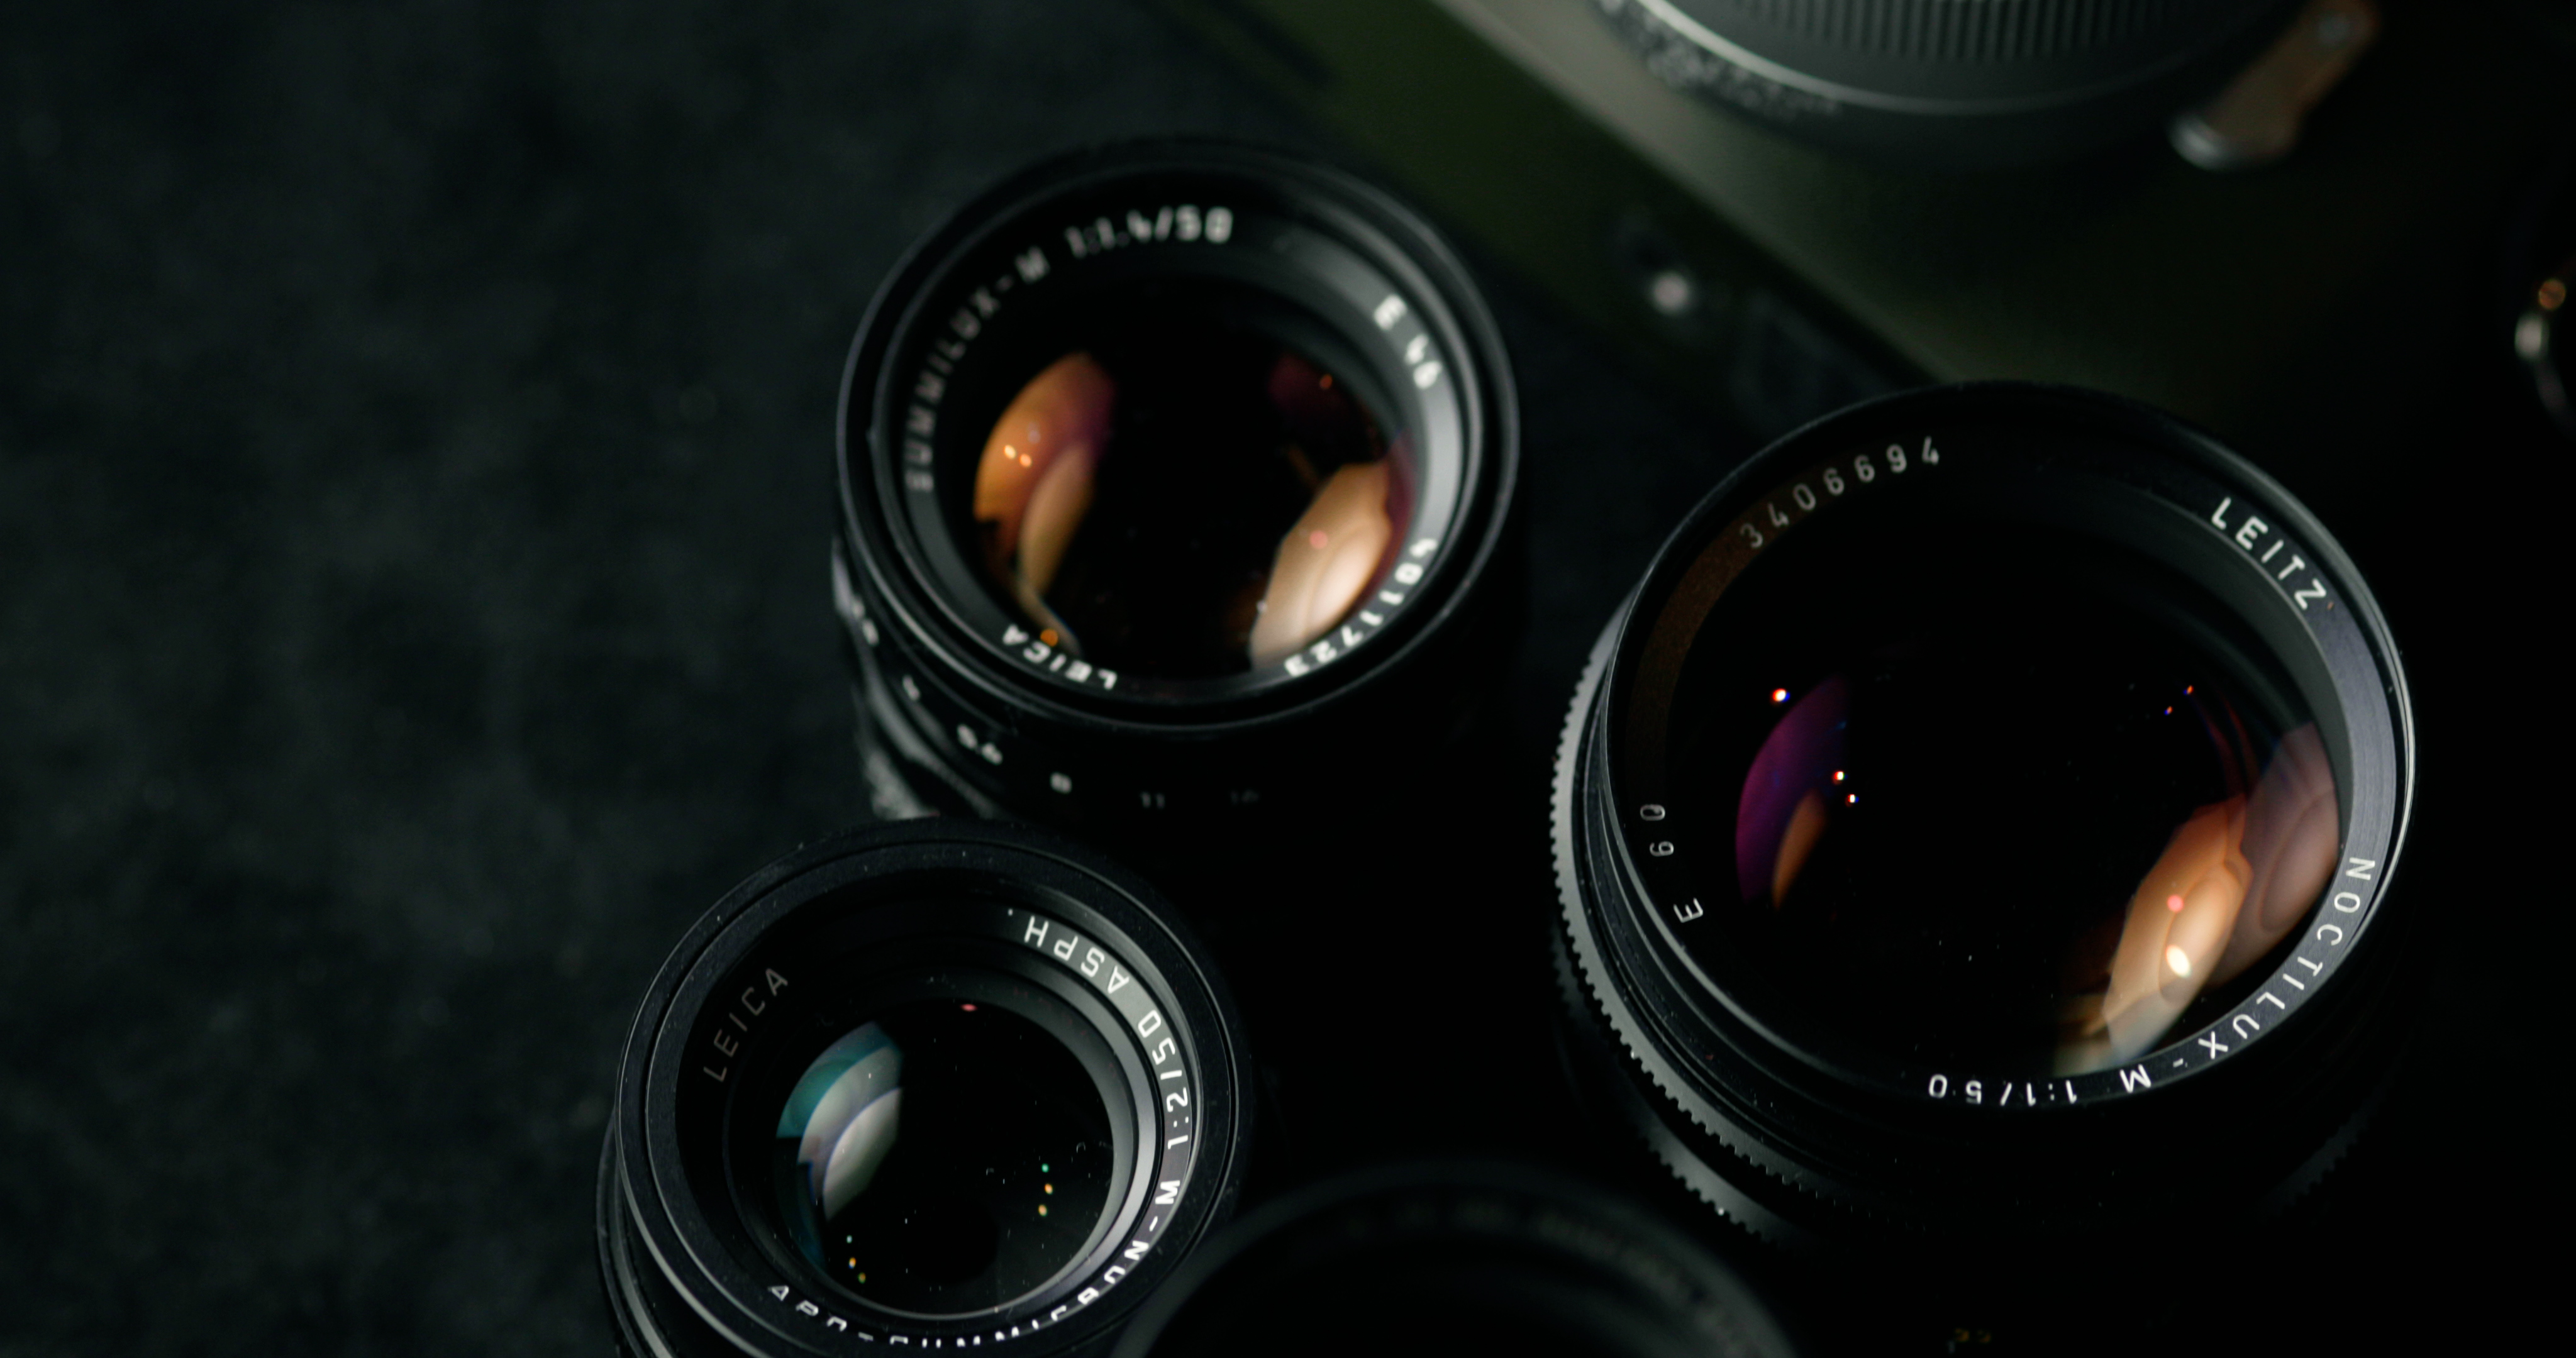 Leica 50mm Summicron 50mm f/2.0 Apo vs. Zeiss Sonnar 50mm f/1.5 - A Comparison Review